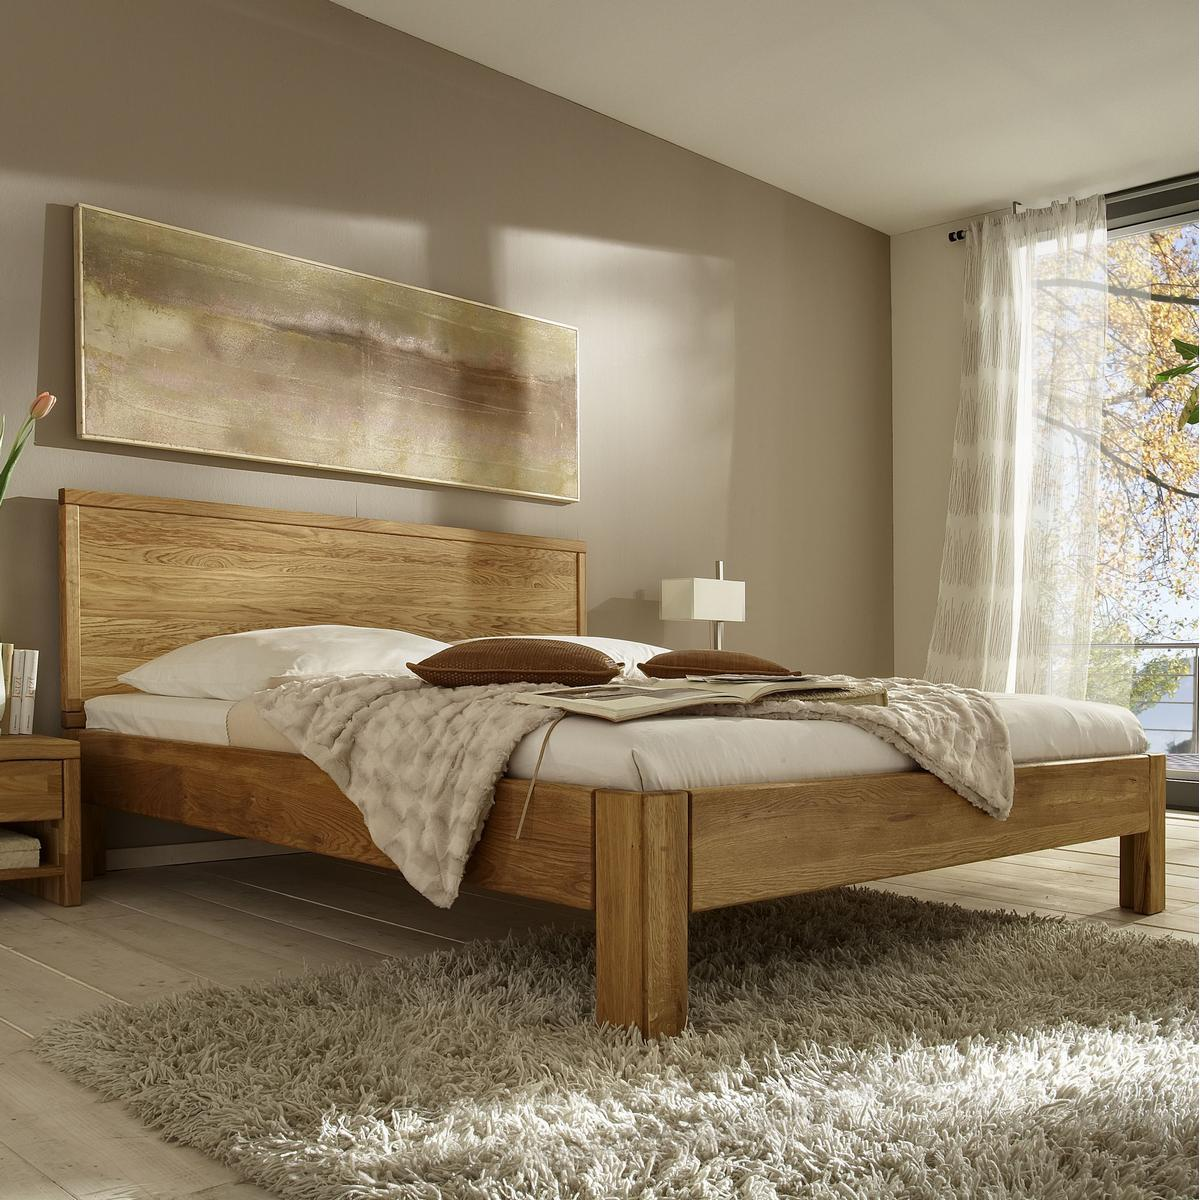 massivholz bett 160x200 xl easy sleep eiche massiv ge lt 9316 93 3. Black Bedroom Furniture Sets. Home Design Ideas